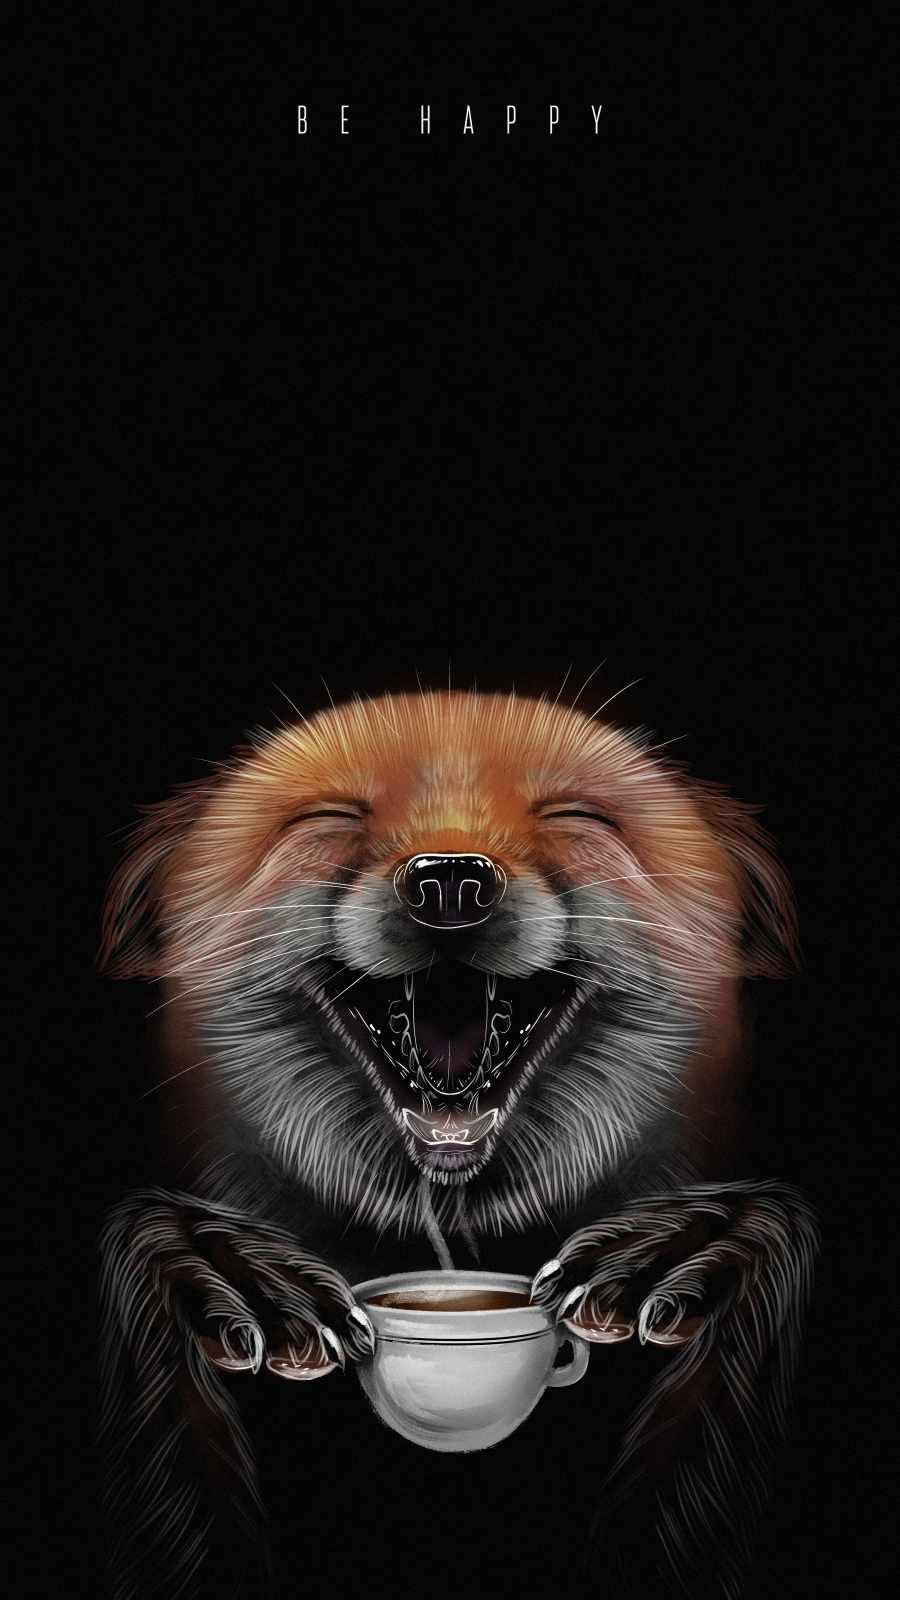 Be Happy iPhone Wallpaper